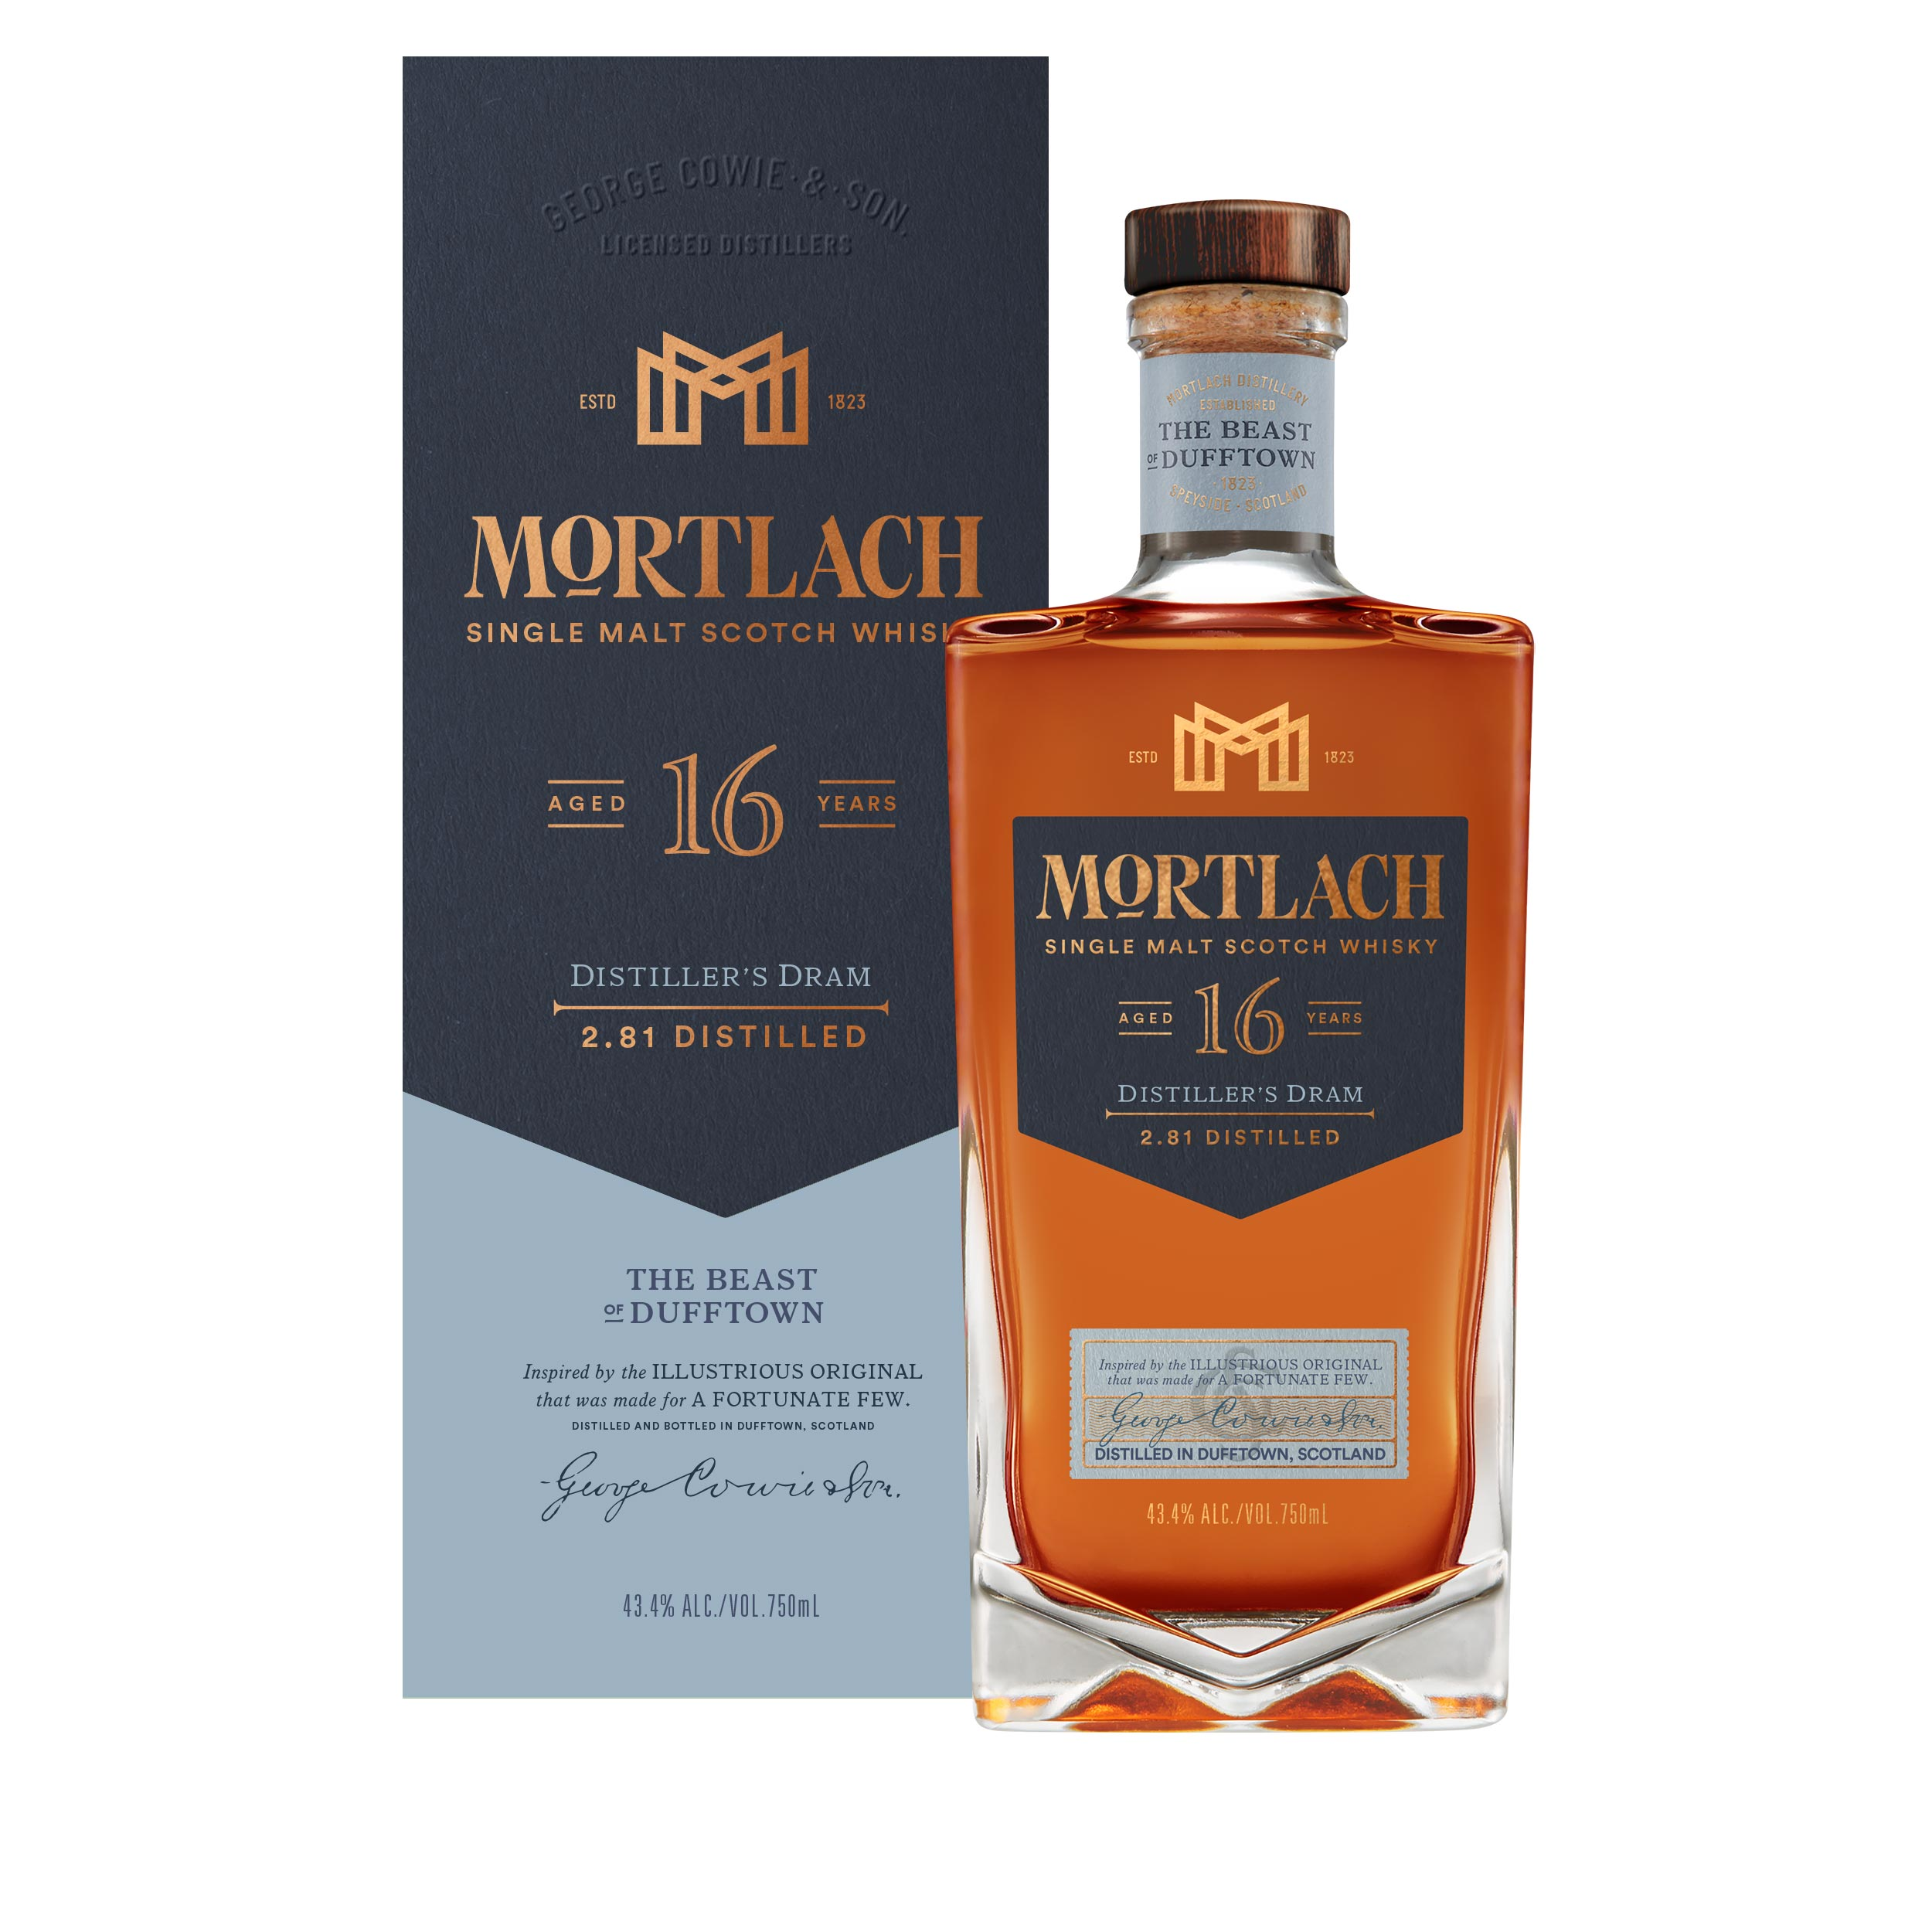 Mortlach 16 Year Old Distillers Dram